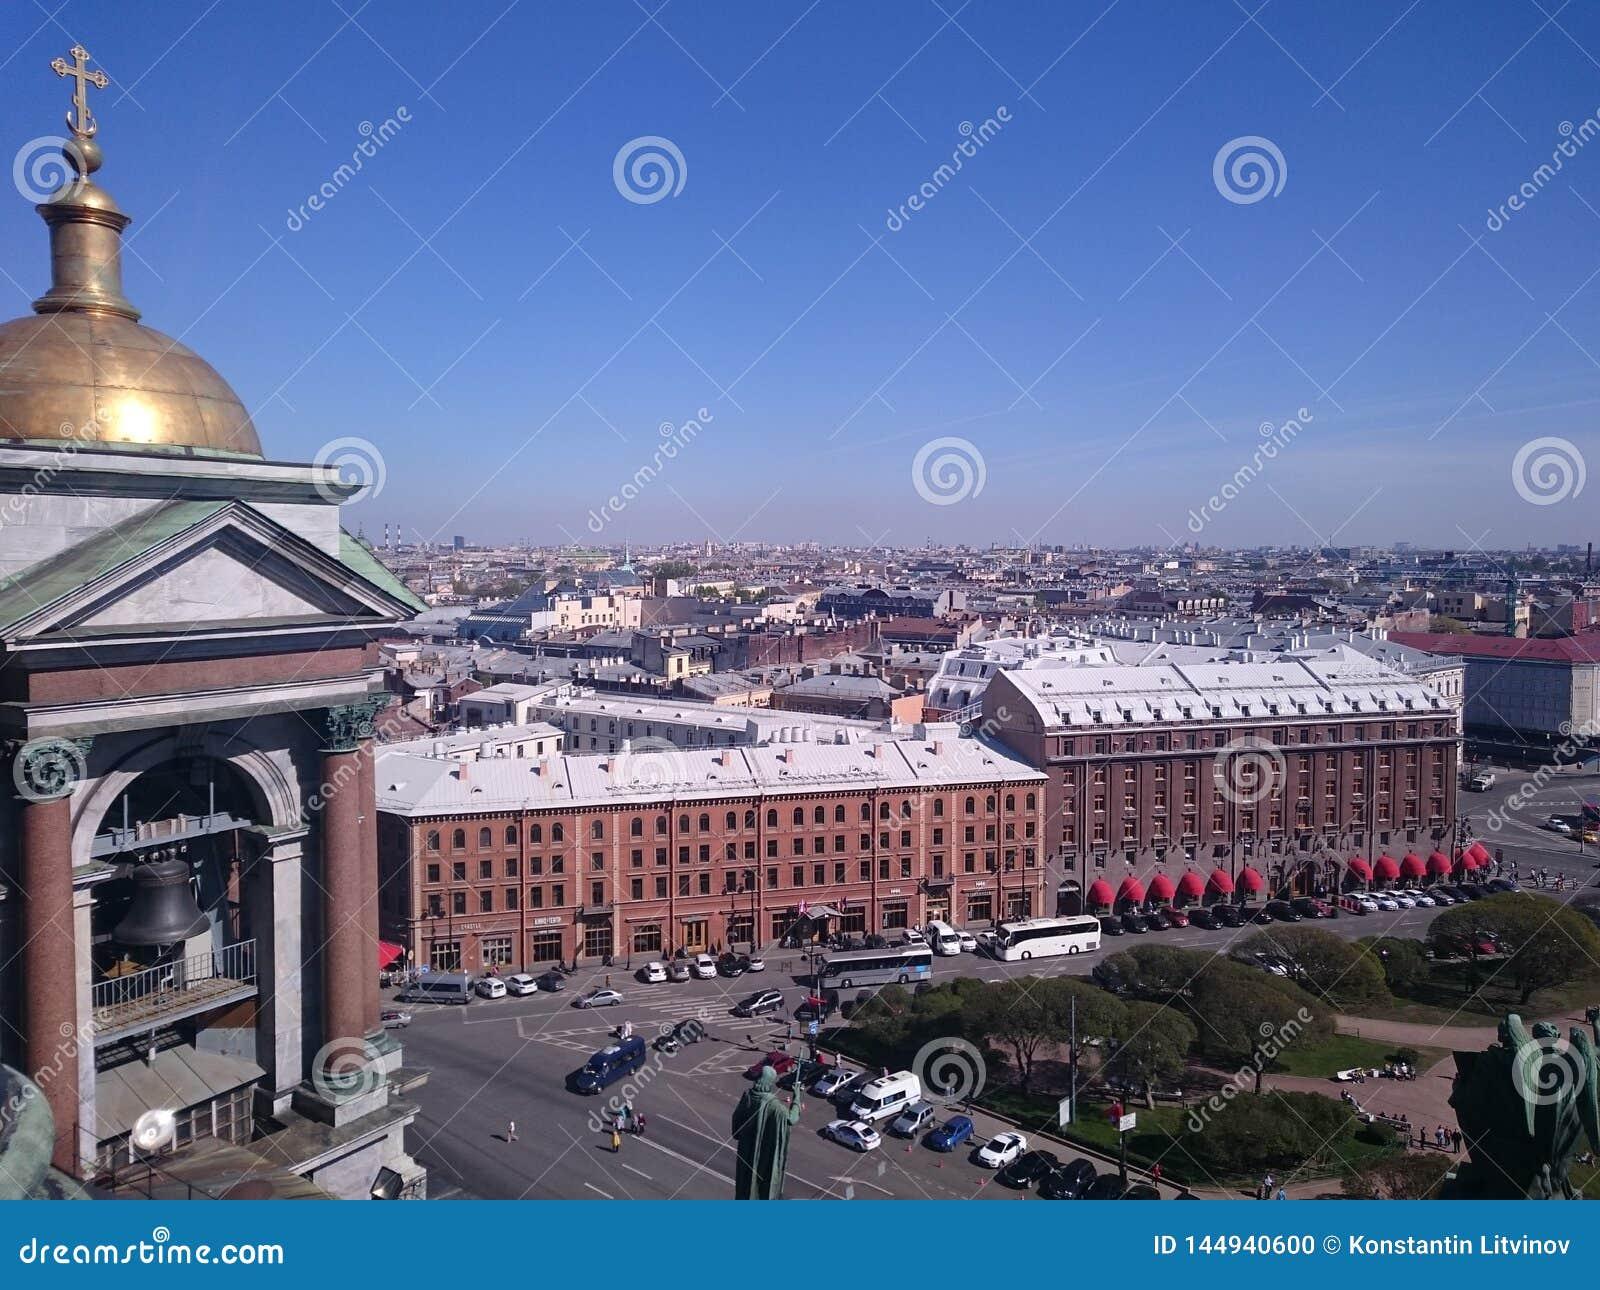 Hotell Angleterre, stället av död av poeten Sergei Yesenin, St Petersburg, Ryssland